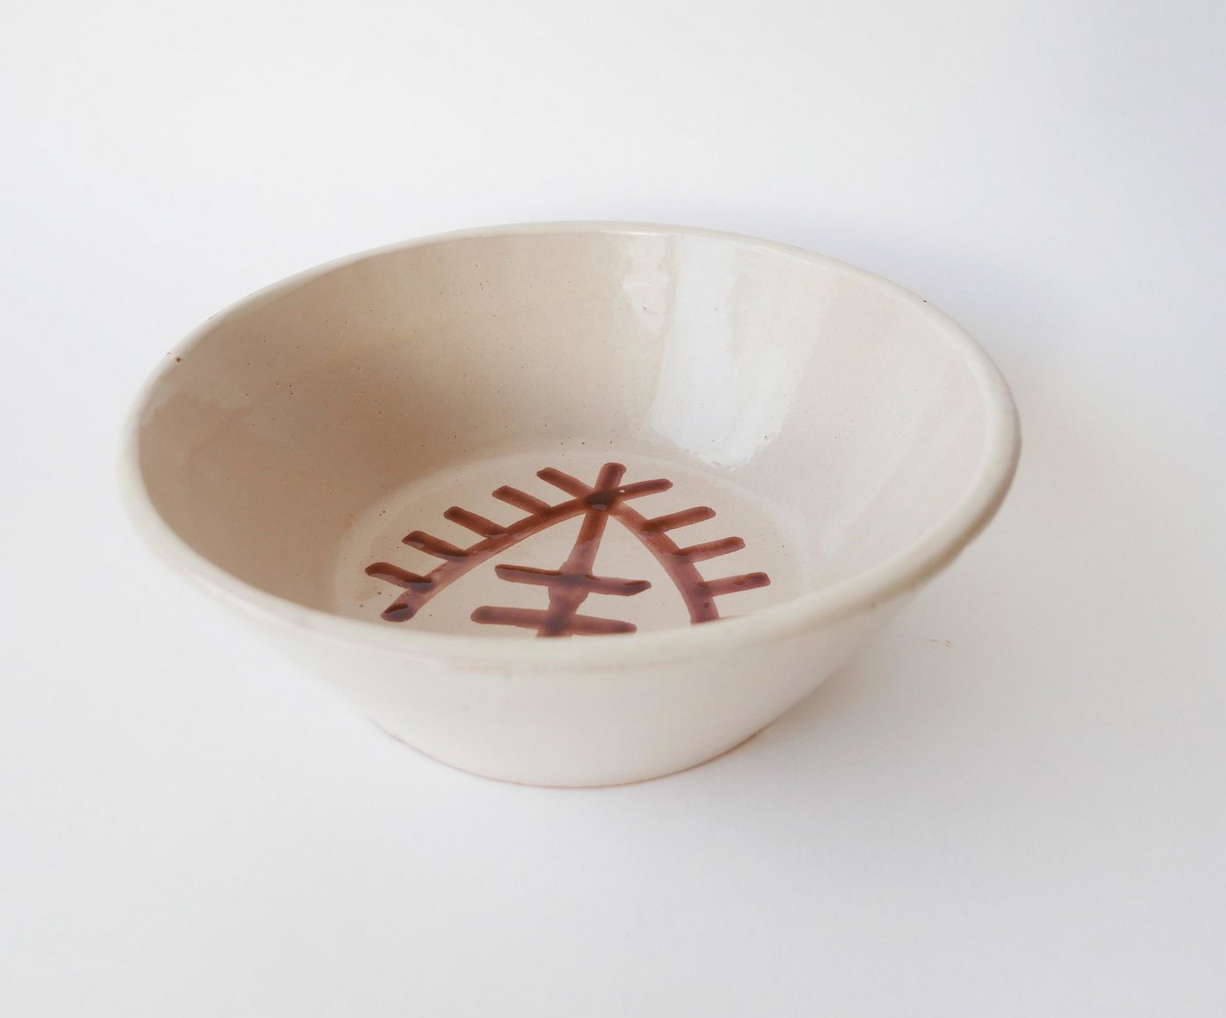 15€ - Bol avec dessin berbère en céramique. Datcha